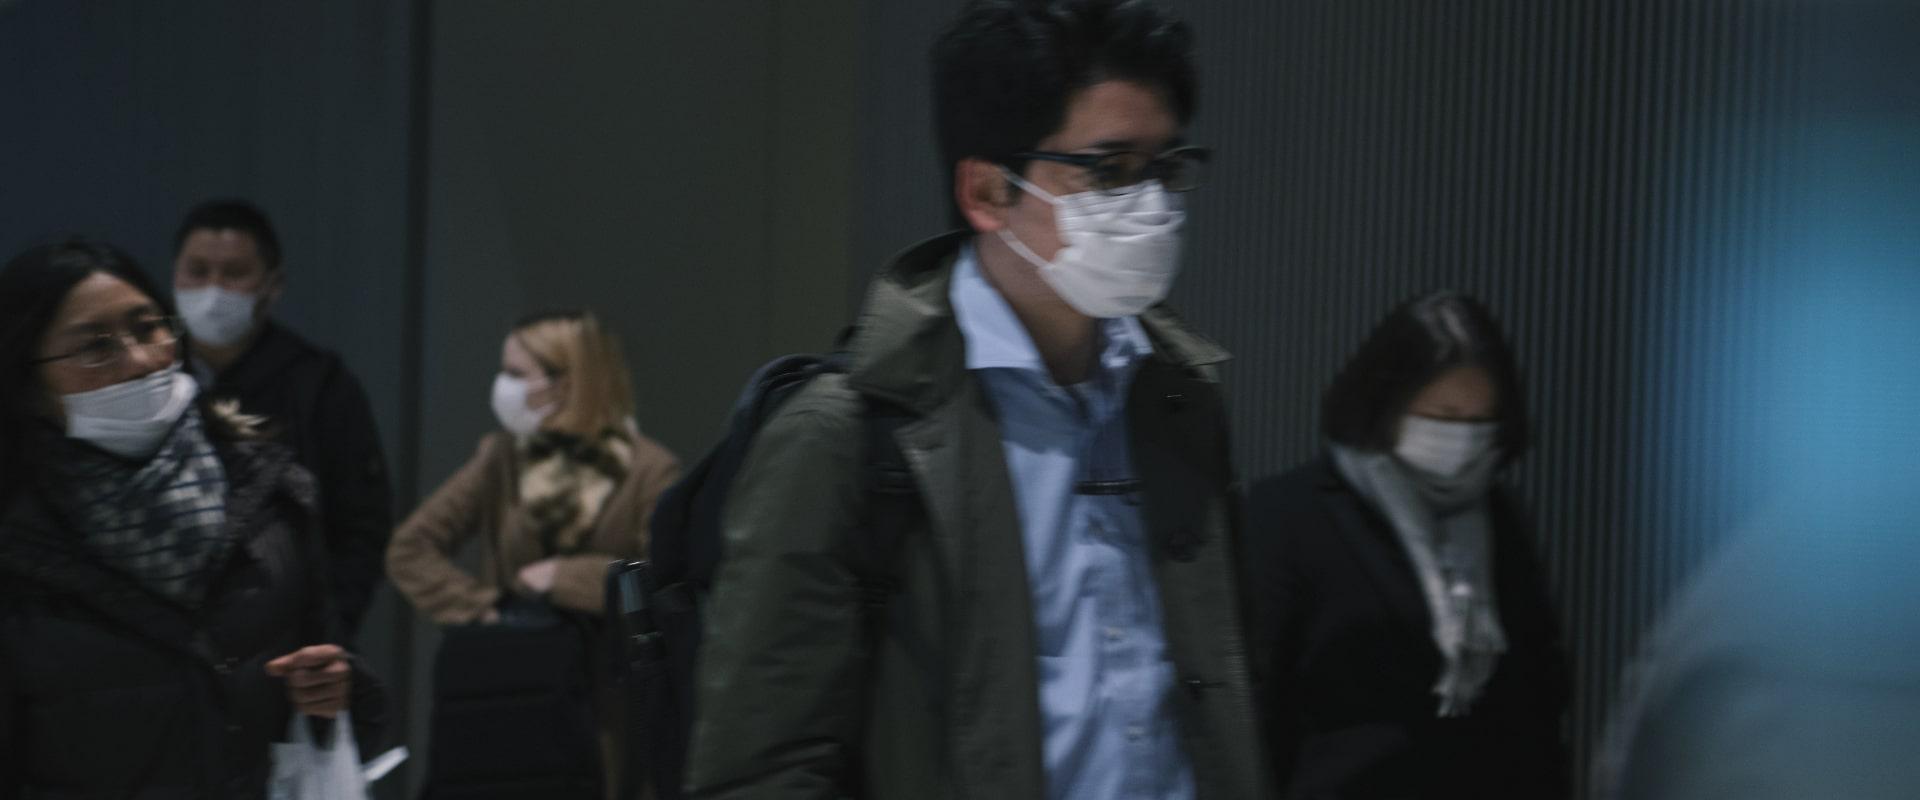 public wearing COVID masks